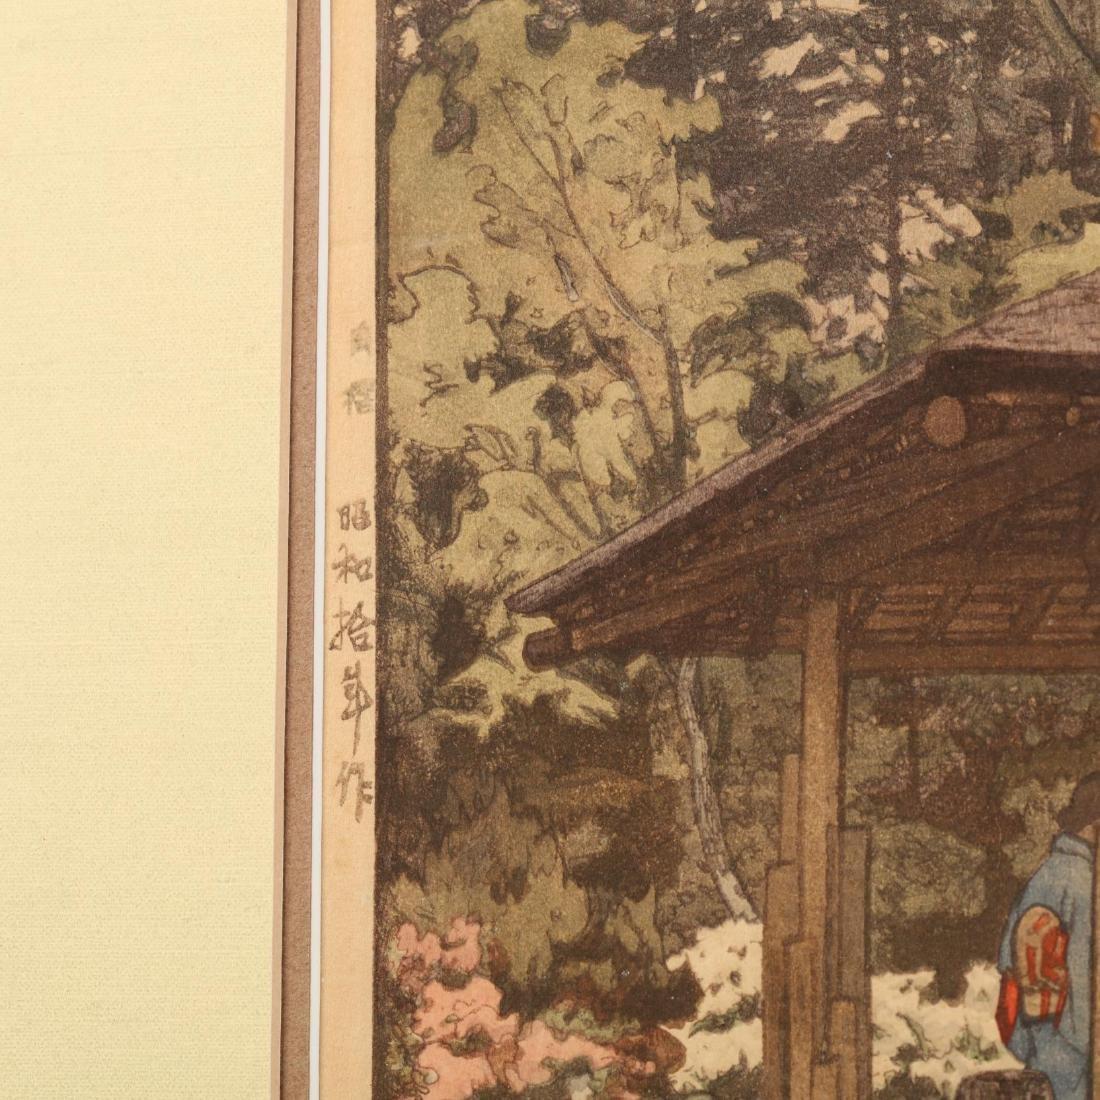 Three Japanese Woodblock Prints by Hiroshi Yoshida - 8